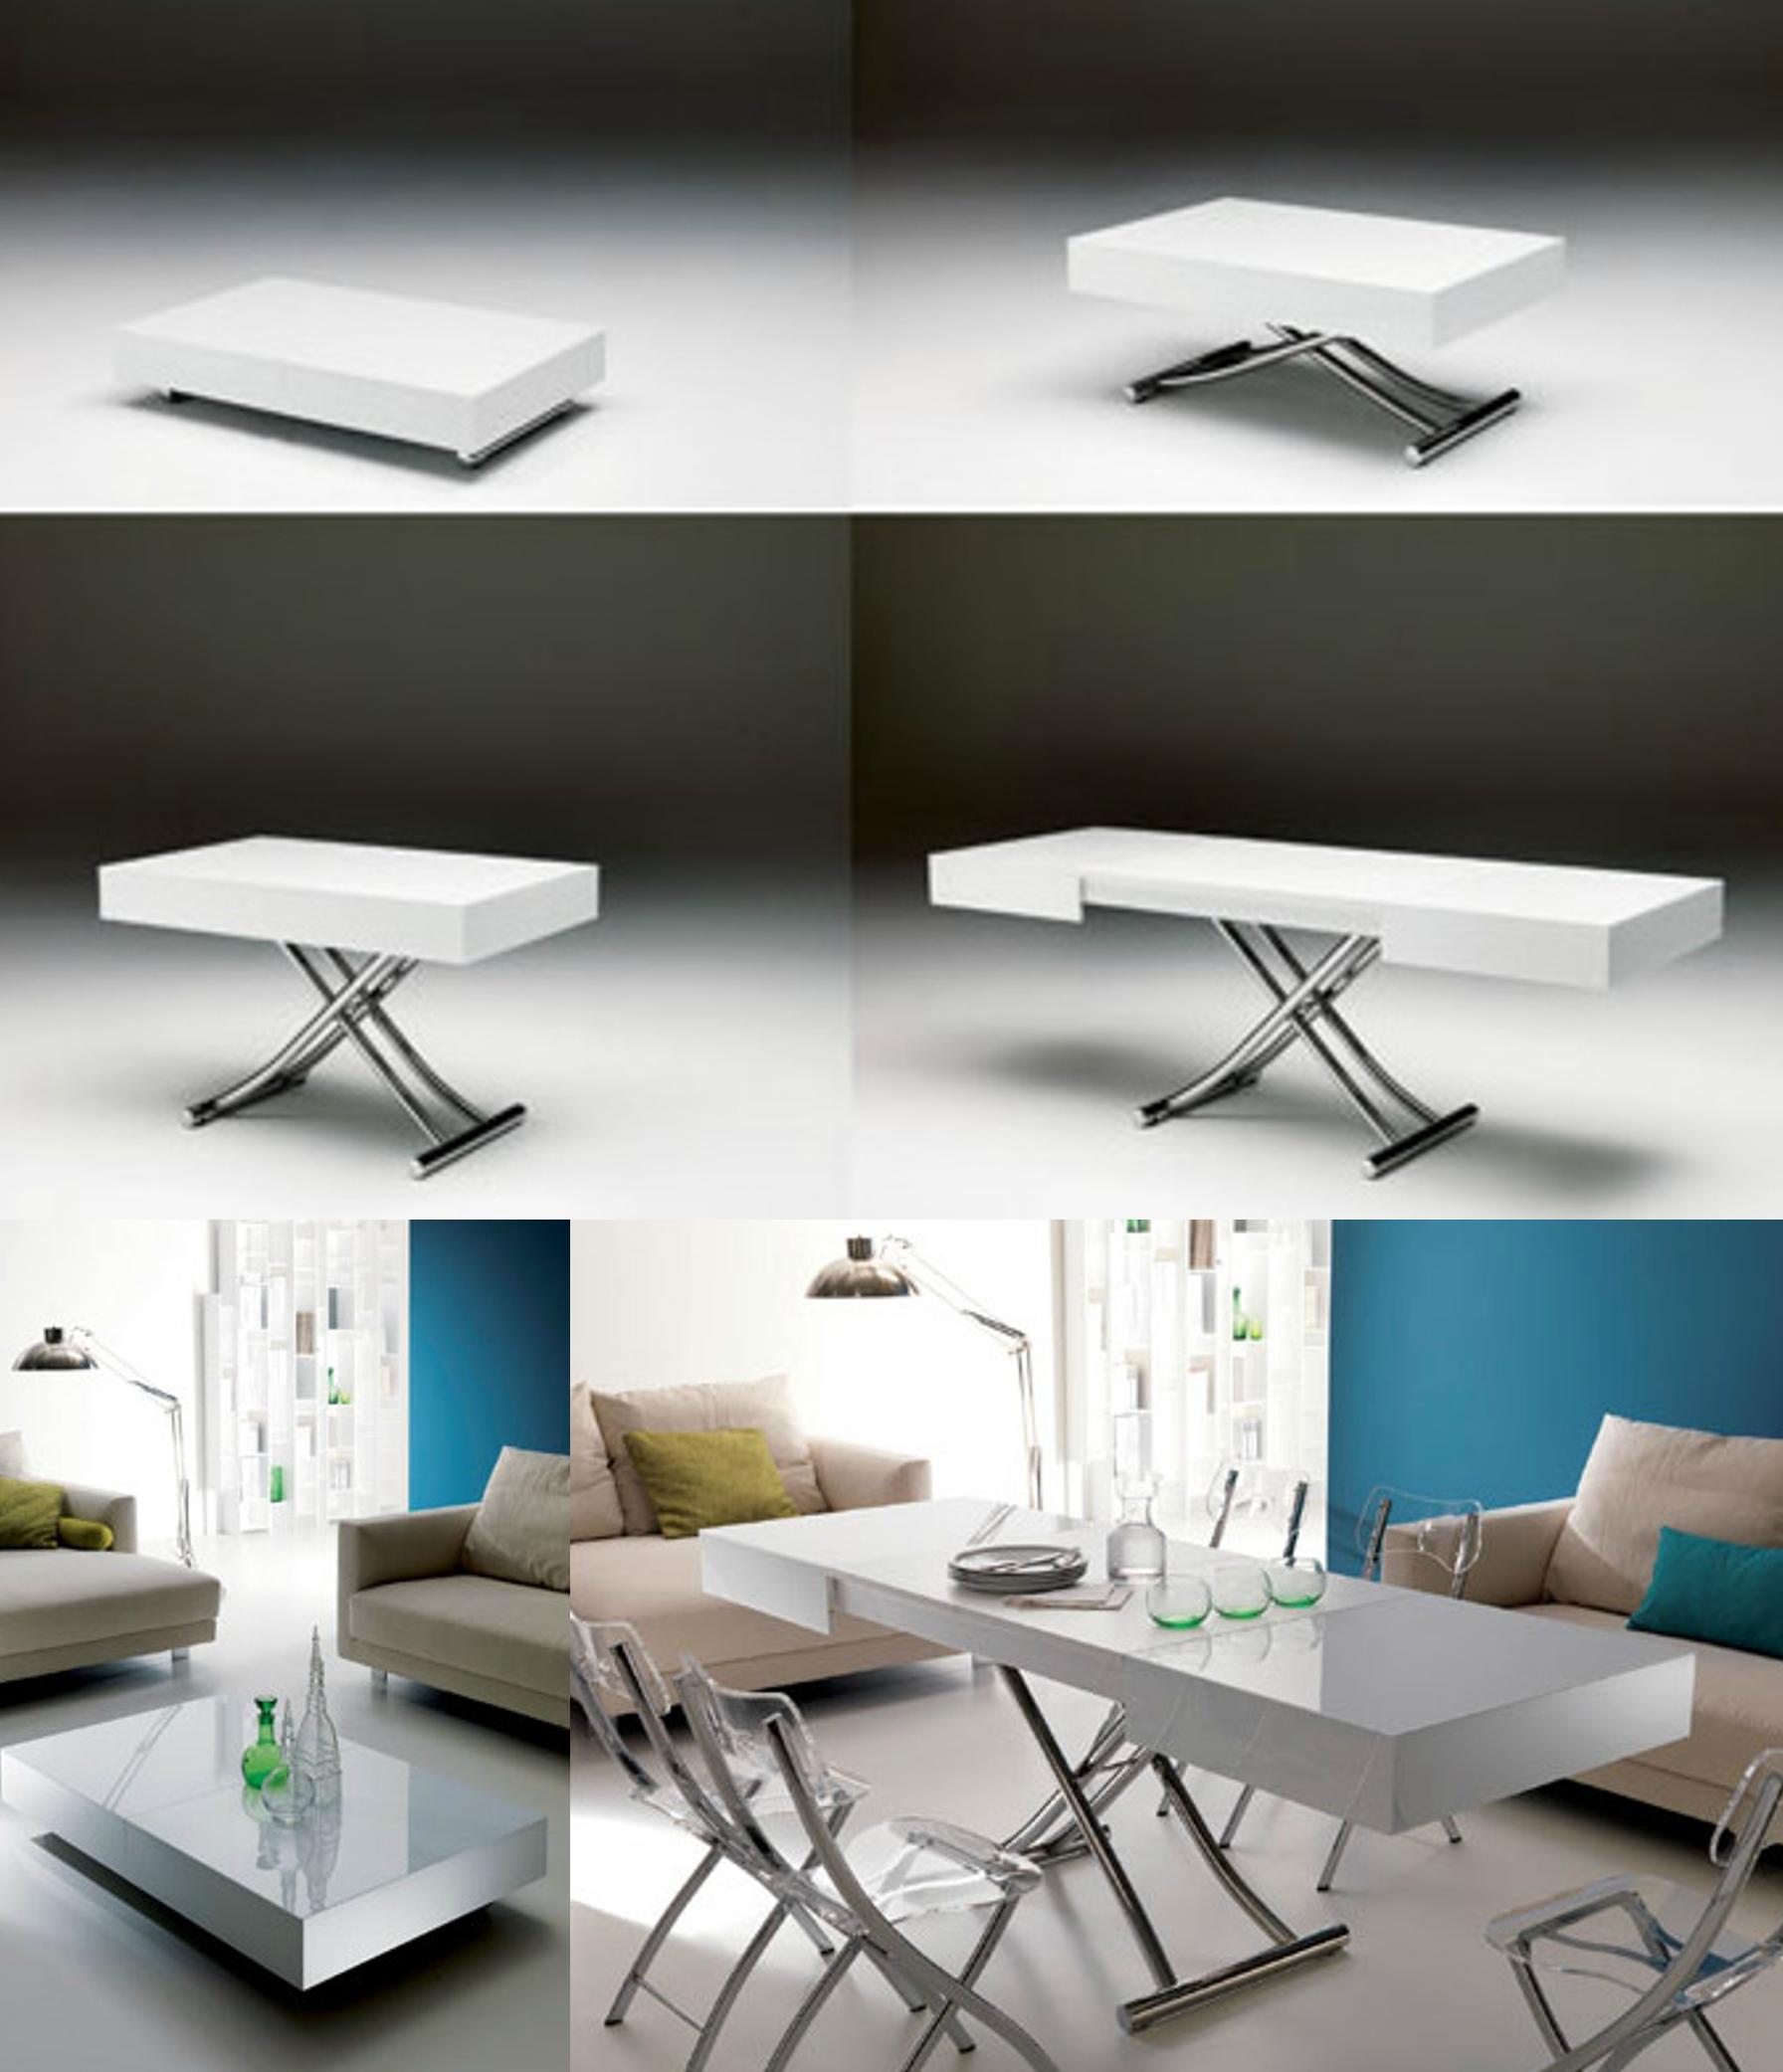 milano box pixel wohnzimmer. Black Bedroom Furniture Sets. Home Design Ideas